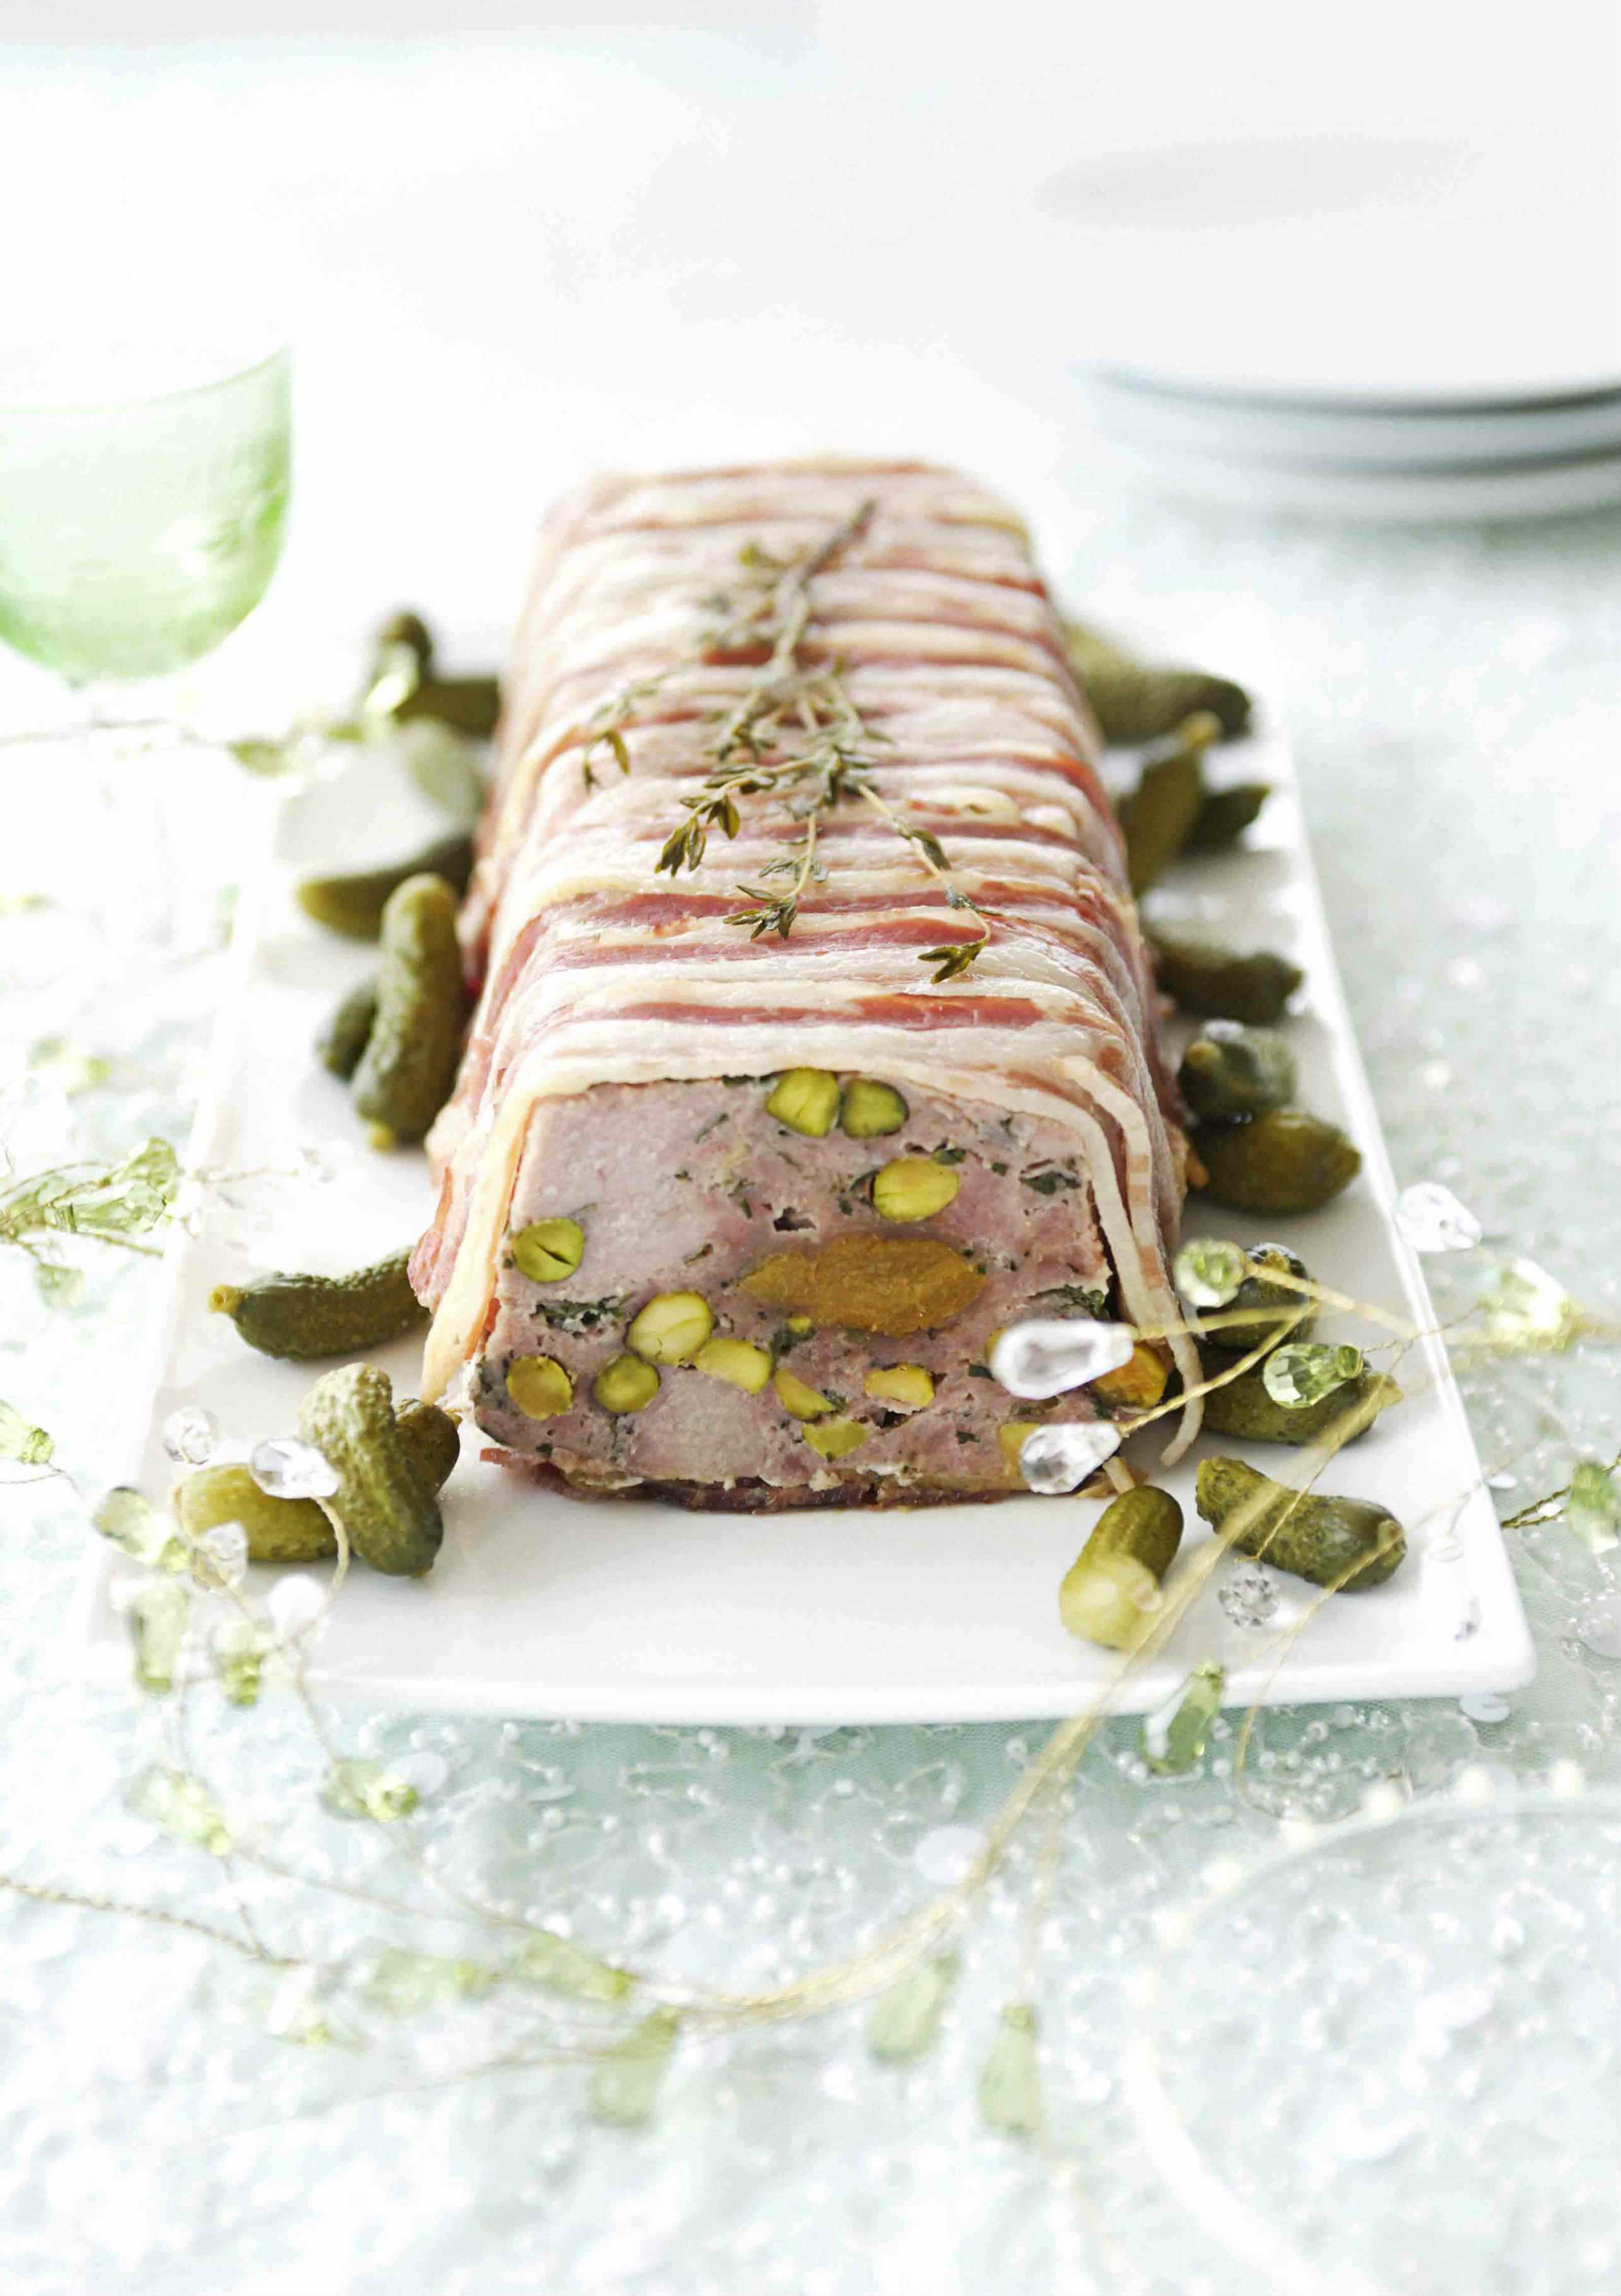 Pork and Pistachio Terrine Recipe with Apricot